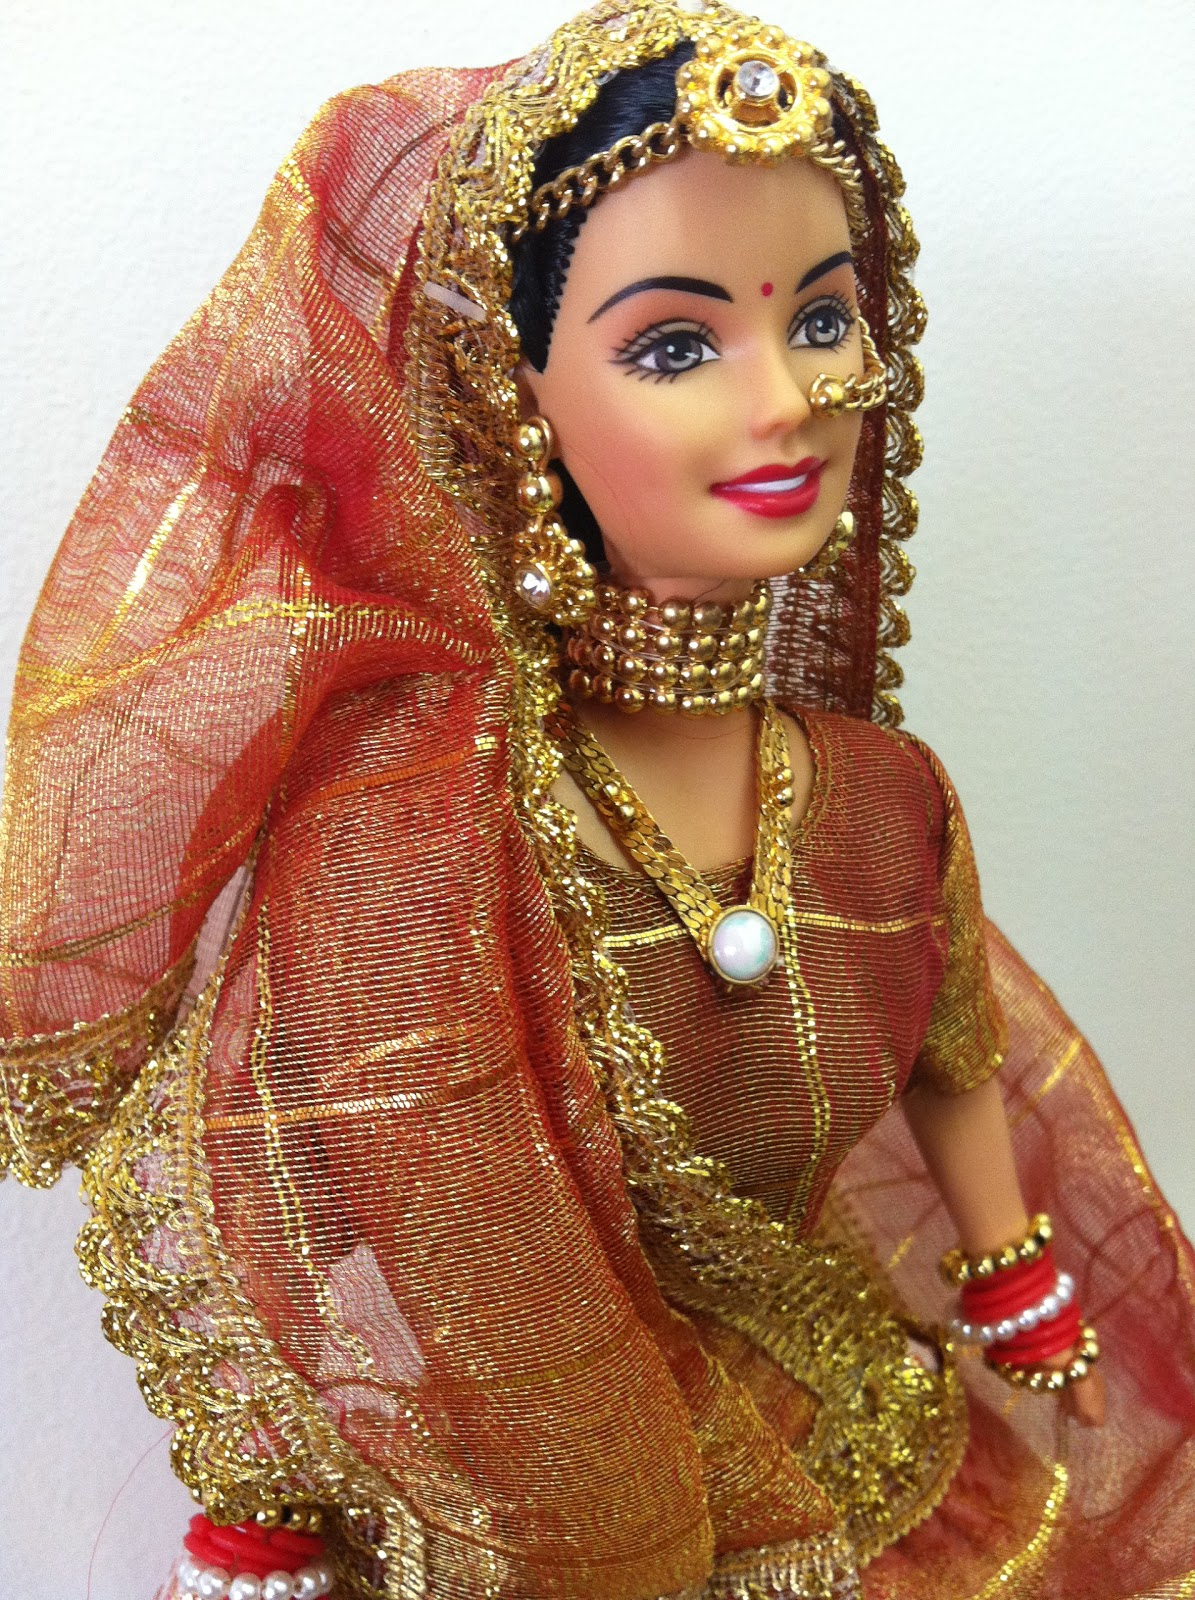 Barbie De Boxed Expressions Of India Wedding Fantasy